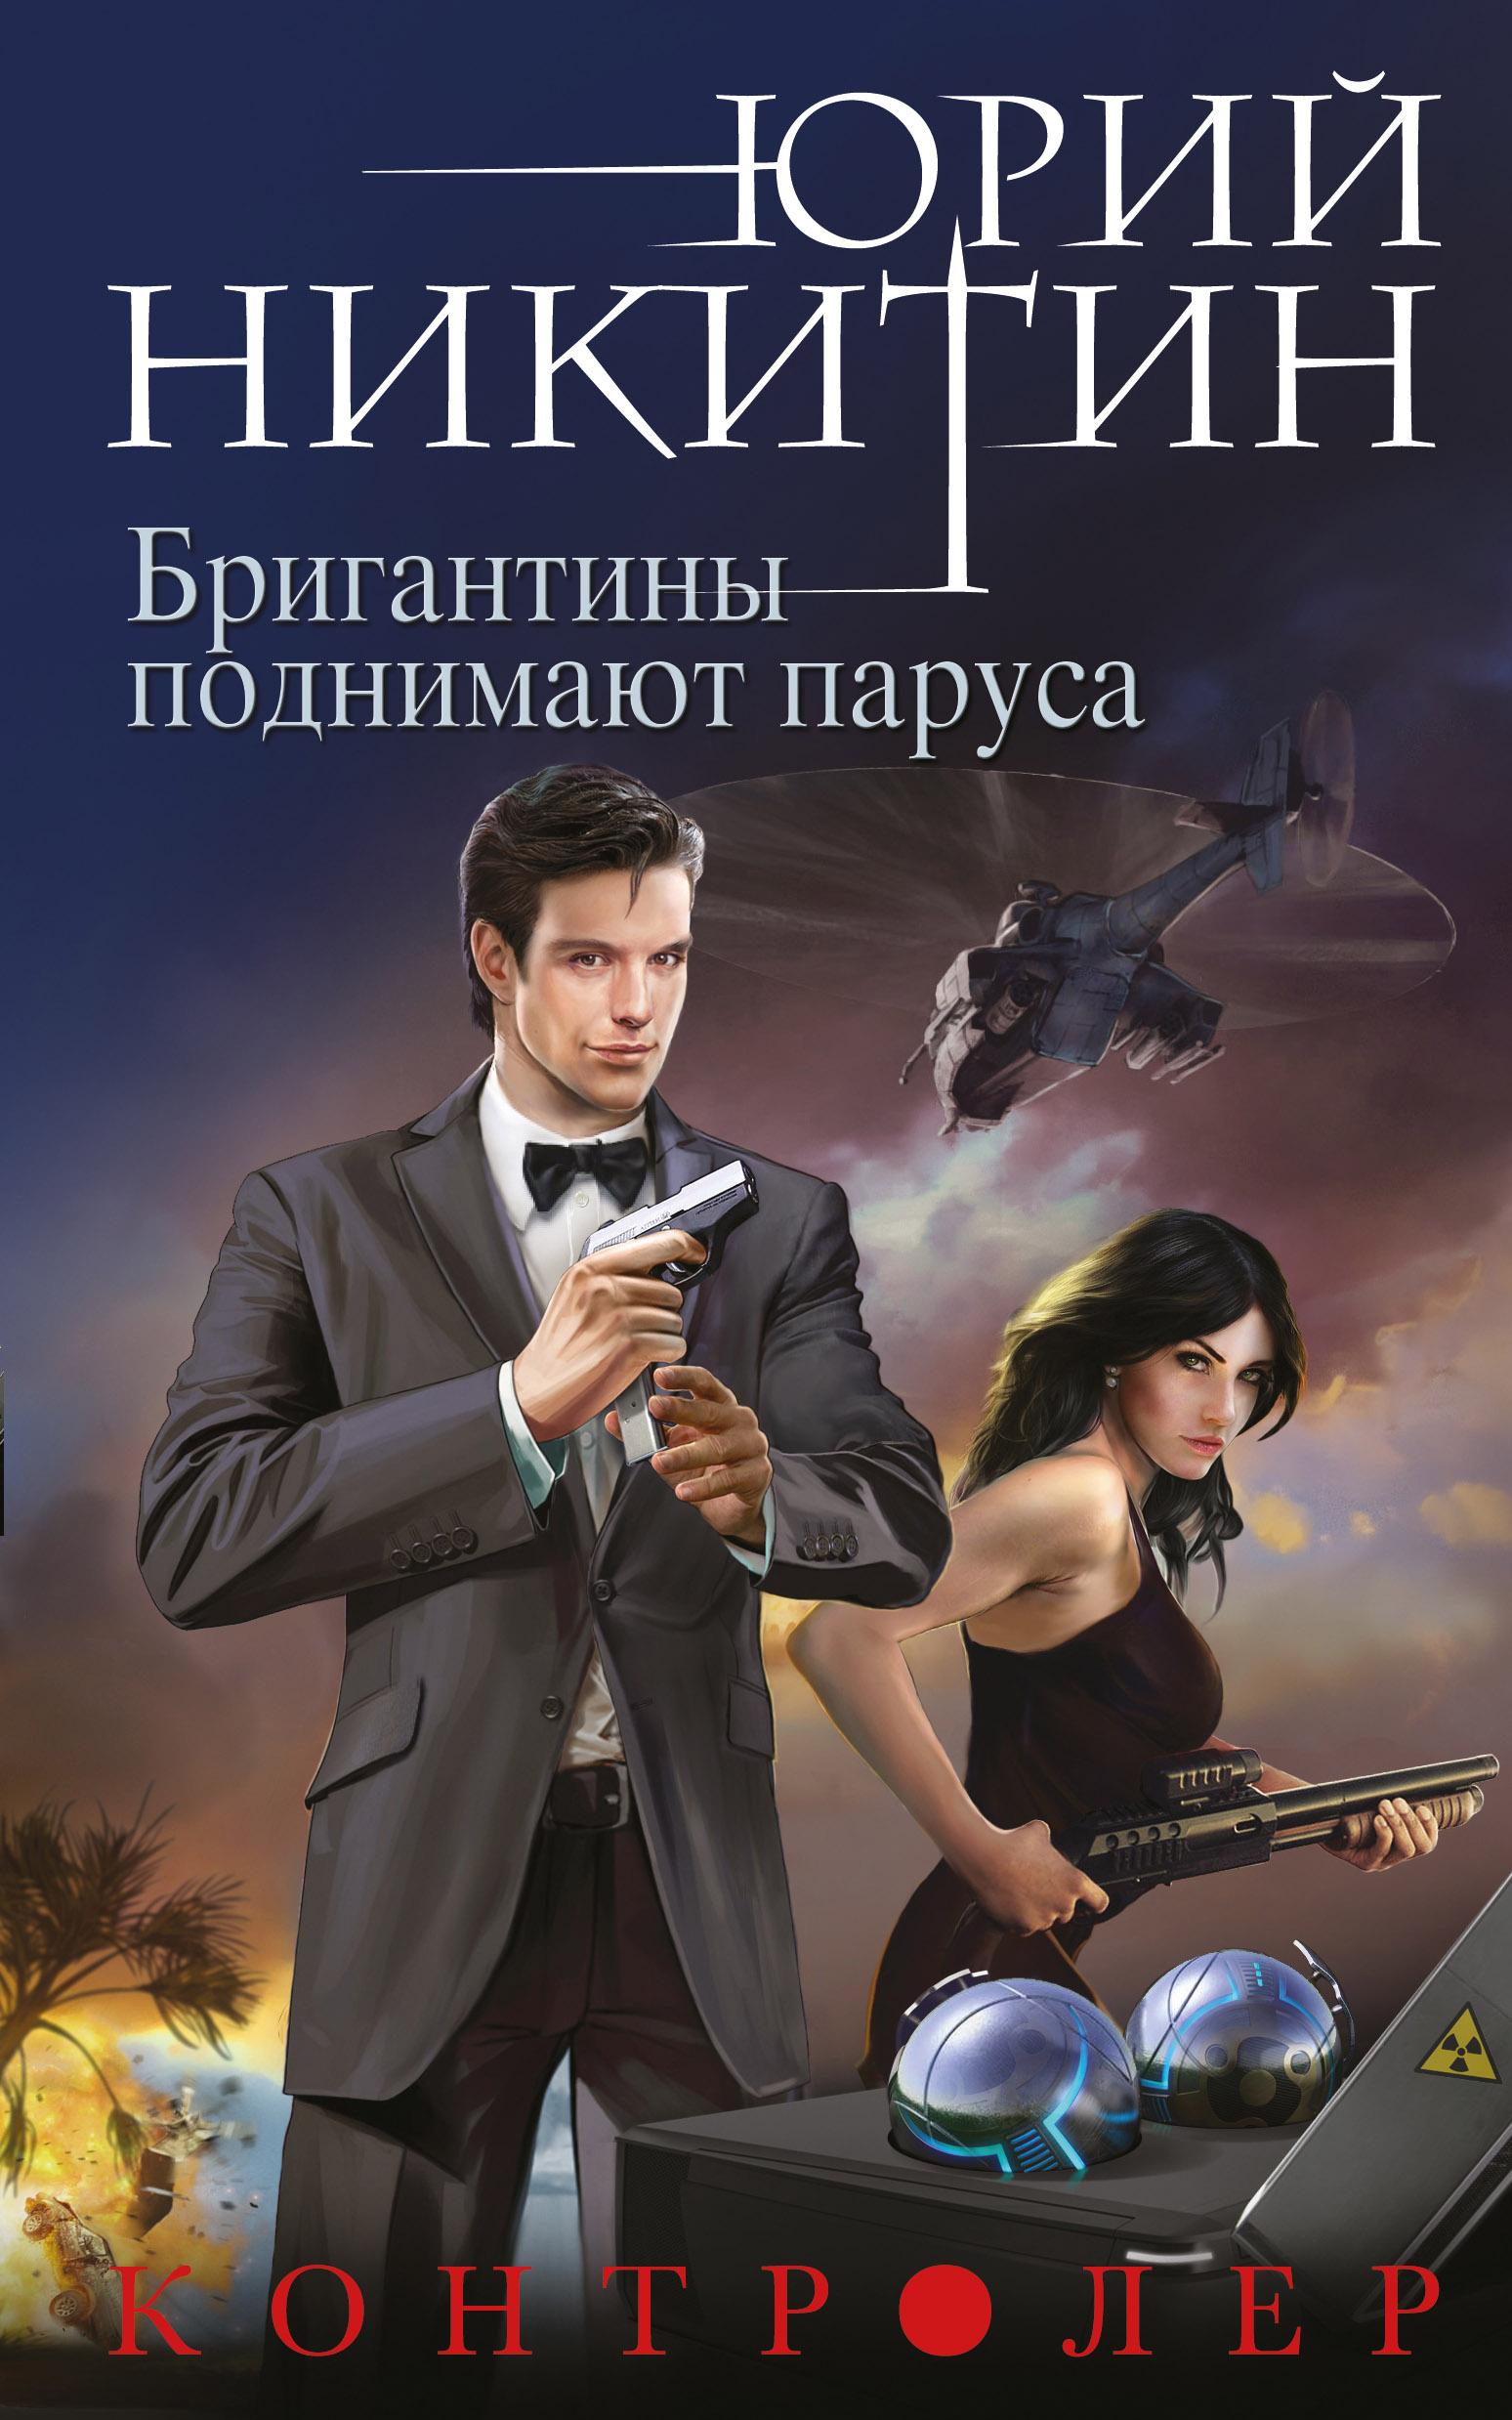 Никитин Юрий Александрович Контролер. Книга 5. Бригантины поднимают паруса